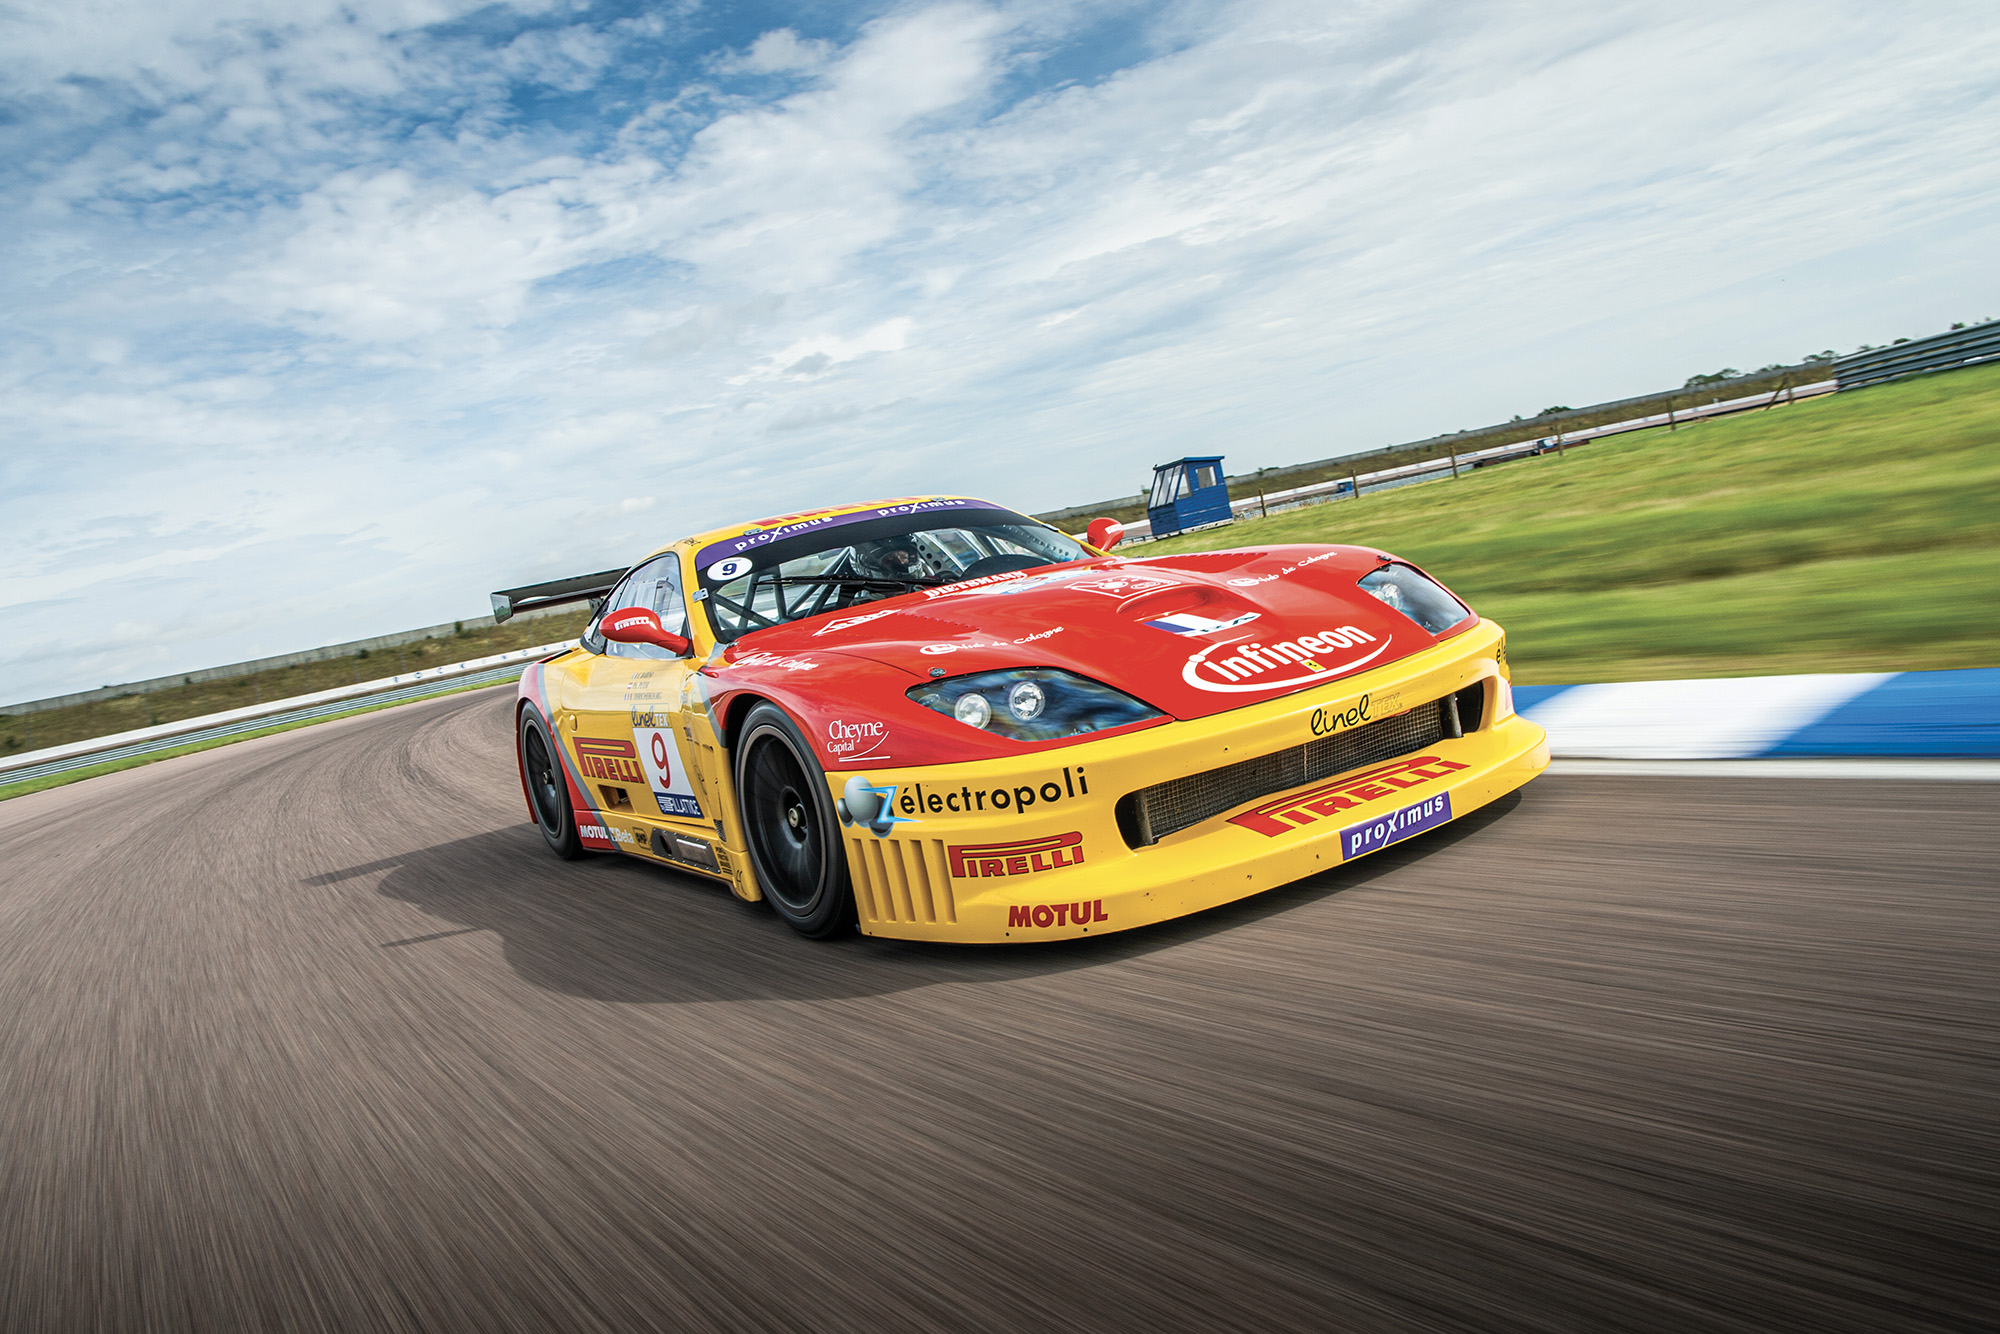 Video: V12 roars again at Rockingham — Ferrari's game-changing 550 Maranello GT1